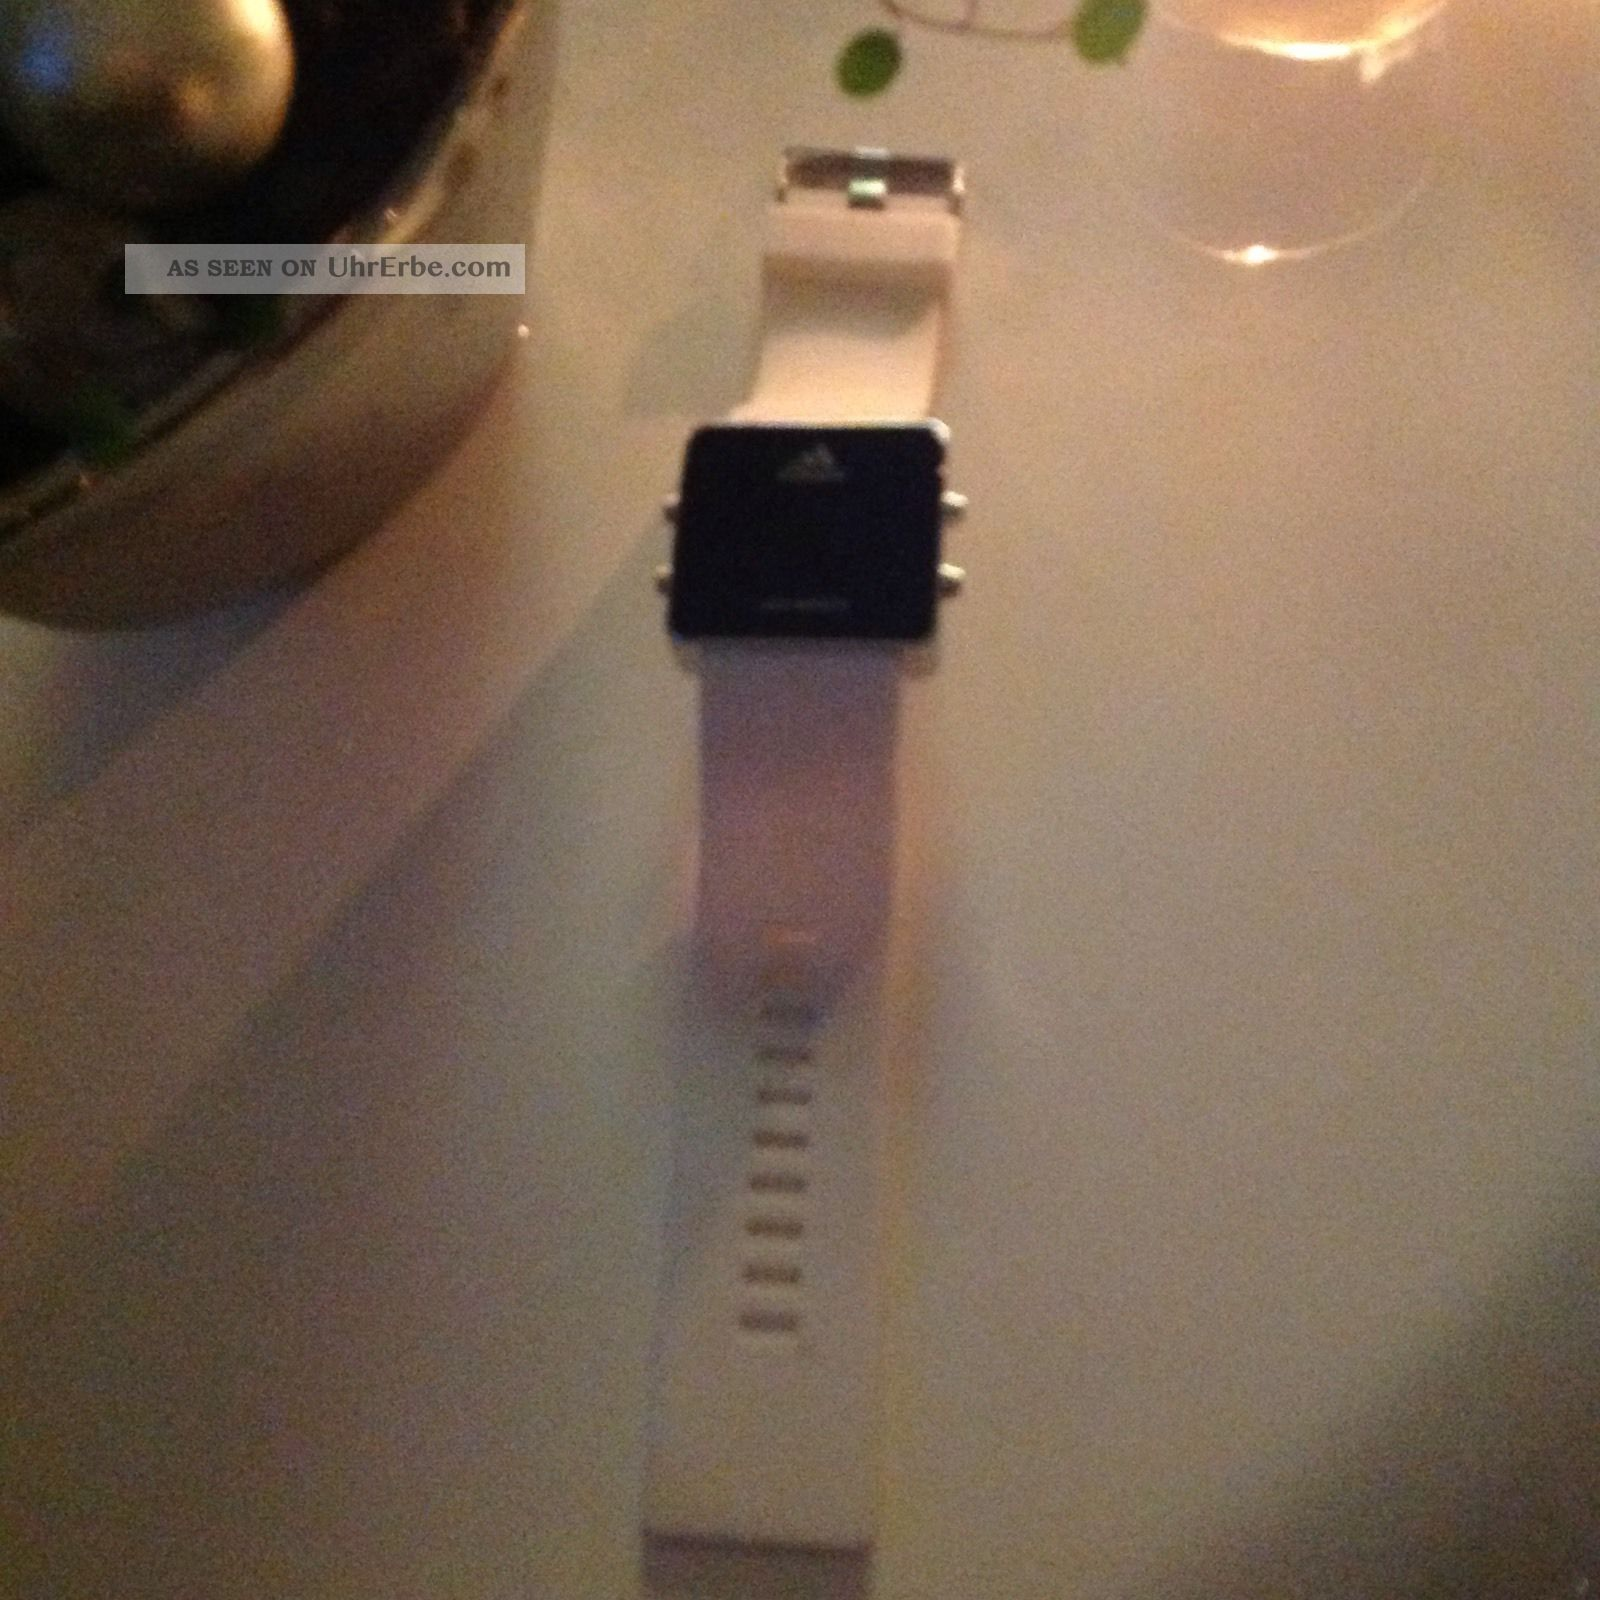 Adidas Led Watch Er&sie Armbanduhren Bild